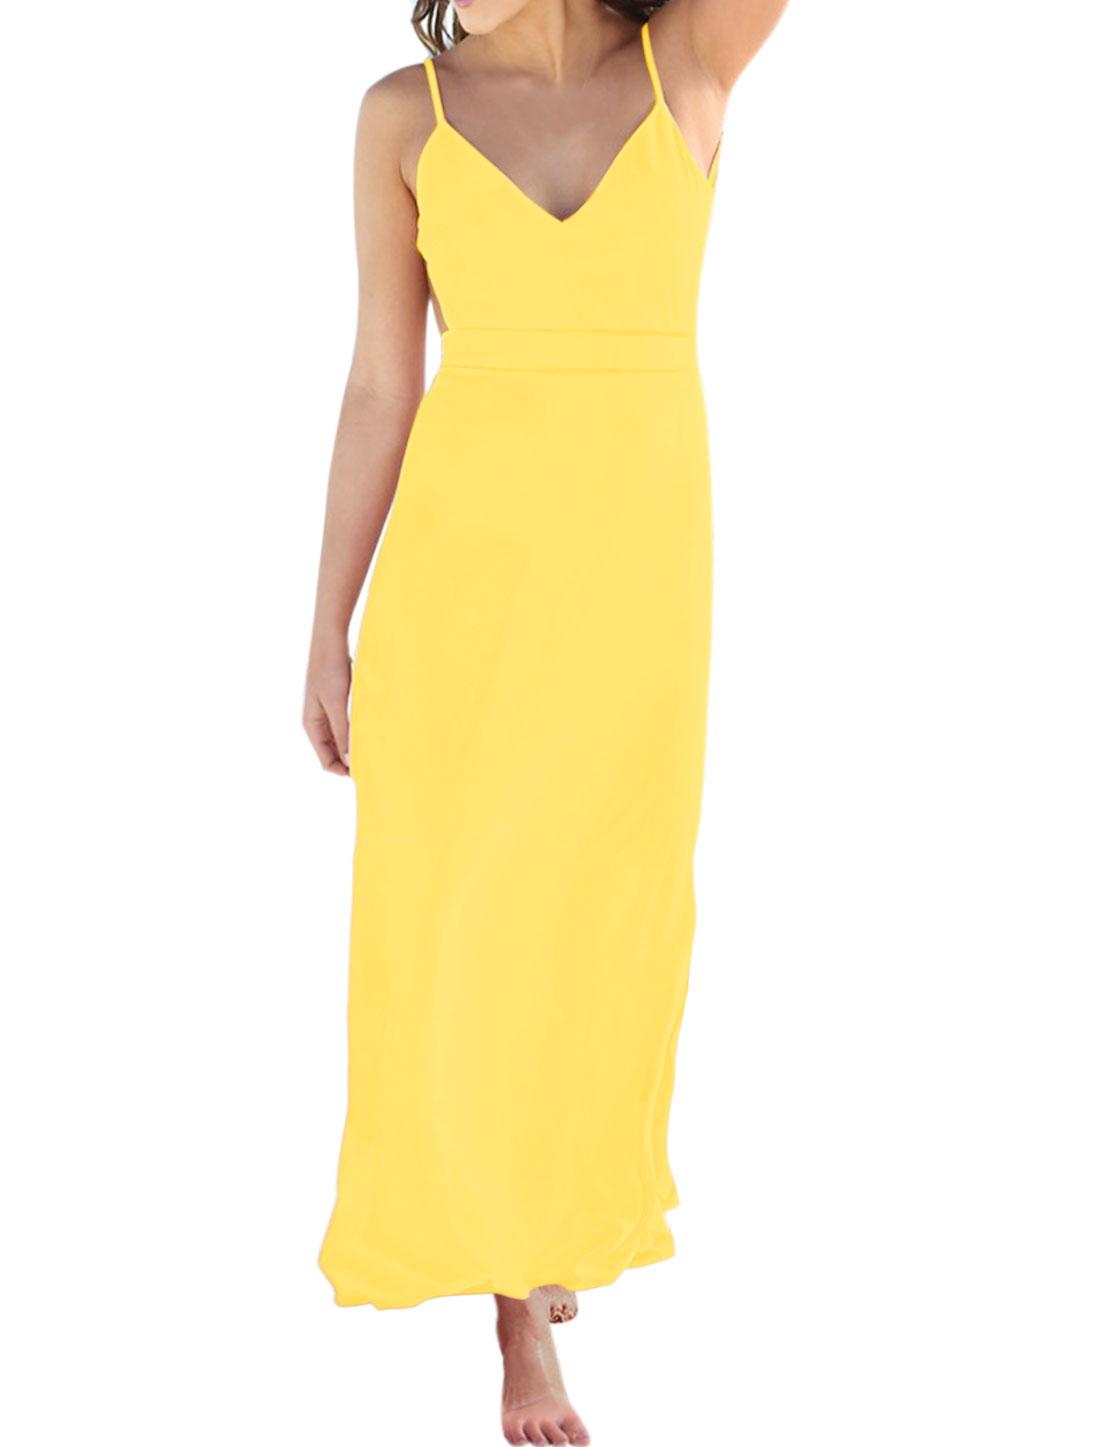 Women Backless V Neckline Spaghetti Straps Maxi Dress Yellow L